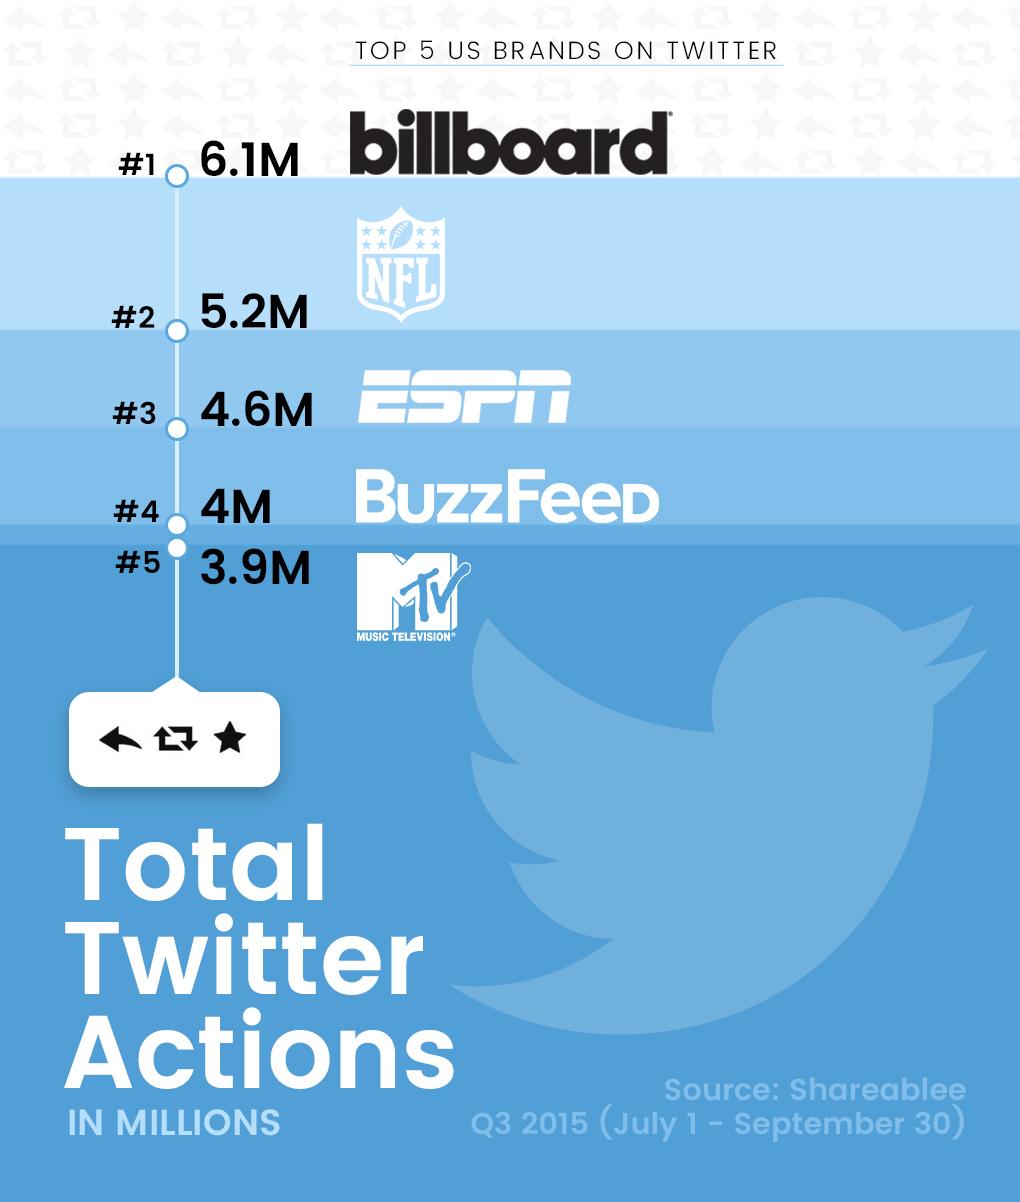 social media press - Billboard Named a Top Five Publishing Brand on Twitter (March 2017)Billboard Ranked No. 1 U.S. Brand on Twitter (2015)Billboard Increases Social Engagement By 558 Percent In Q1 2015Billboard Named No. 1 U.S. Publisher on Twitter For Second Half of 2015Top 10 Media Publishers for November 2015: Billboard Dominates Twitter Engagement